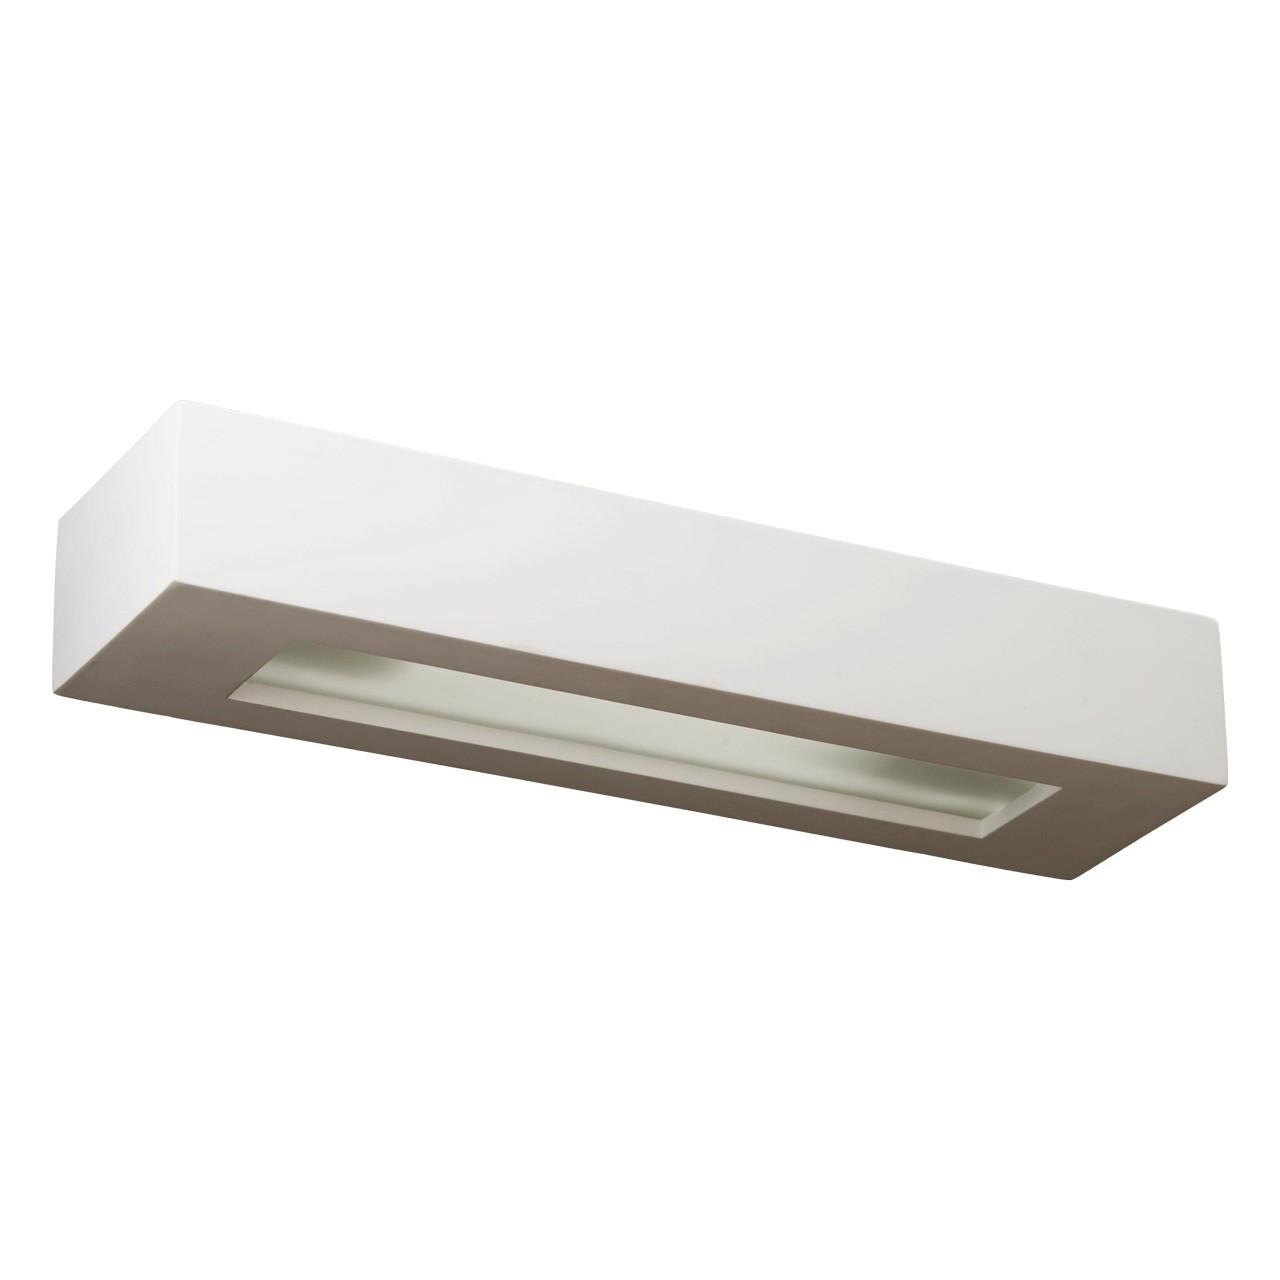 Бра Mw light 499022502 бра mw 465022805 жаклин 3х20вт g4 2 3 в chipled 12 в металл